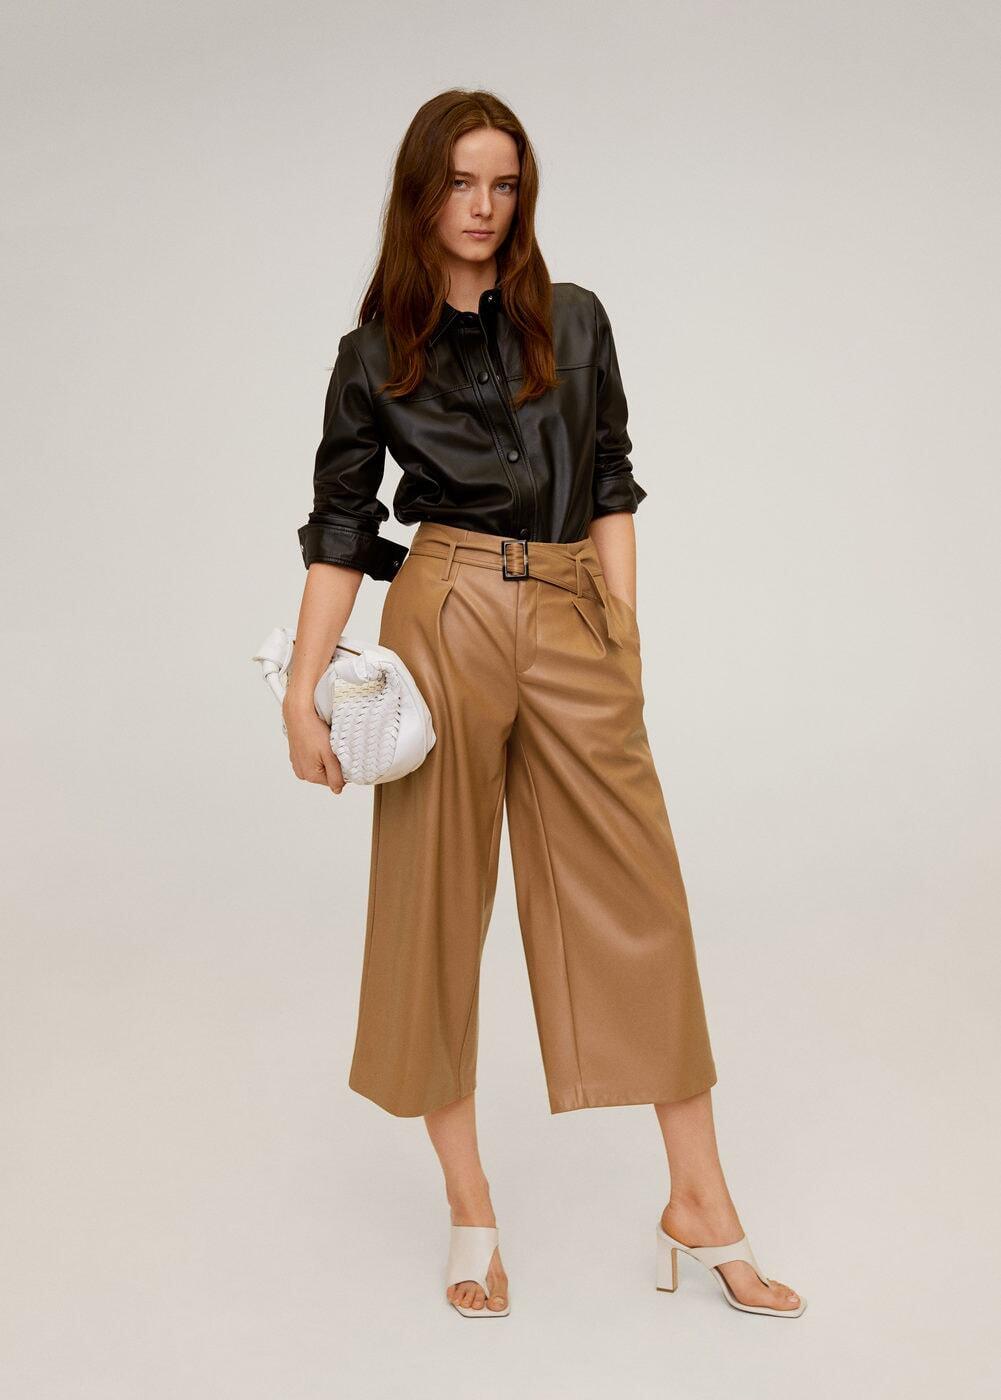 quần culottes da áo sơmi da đen mango